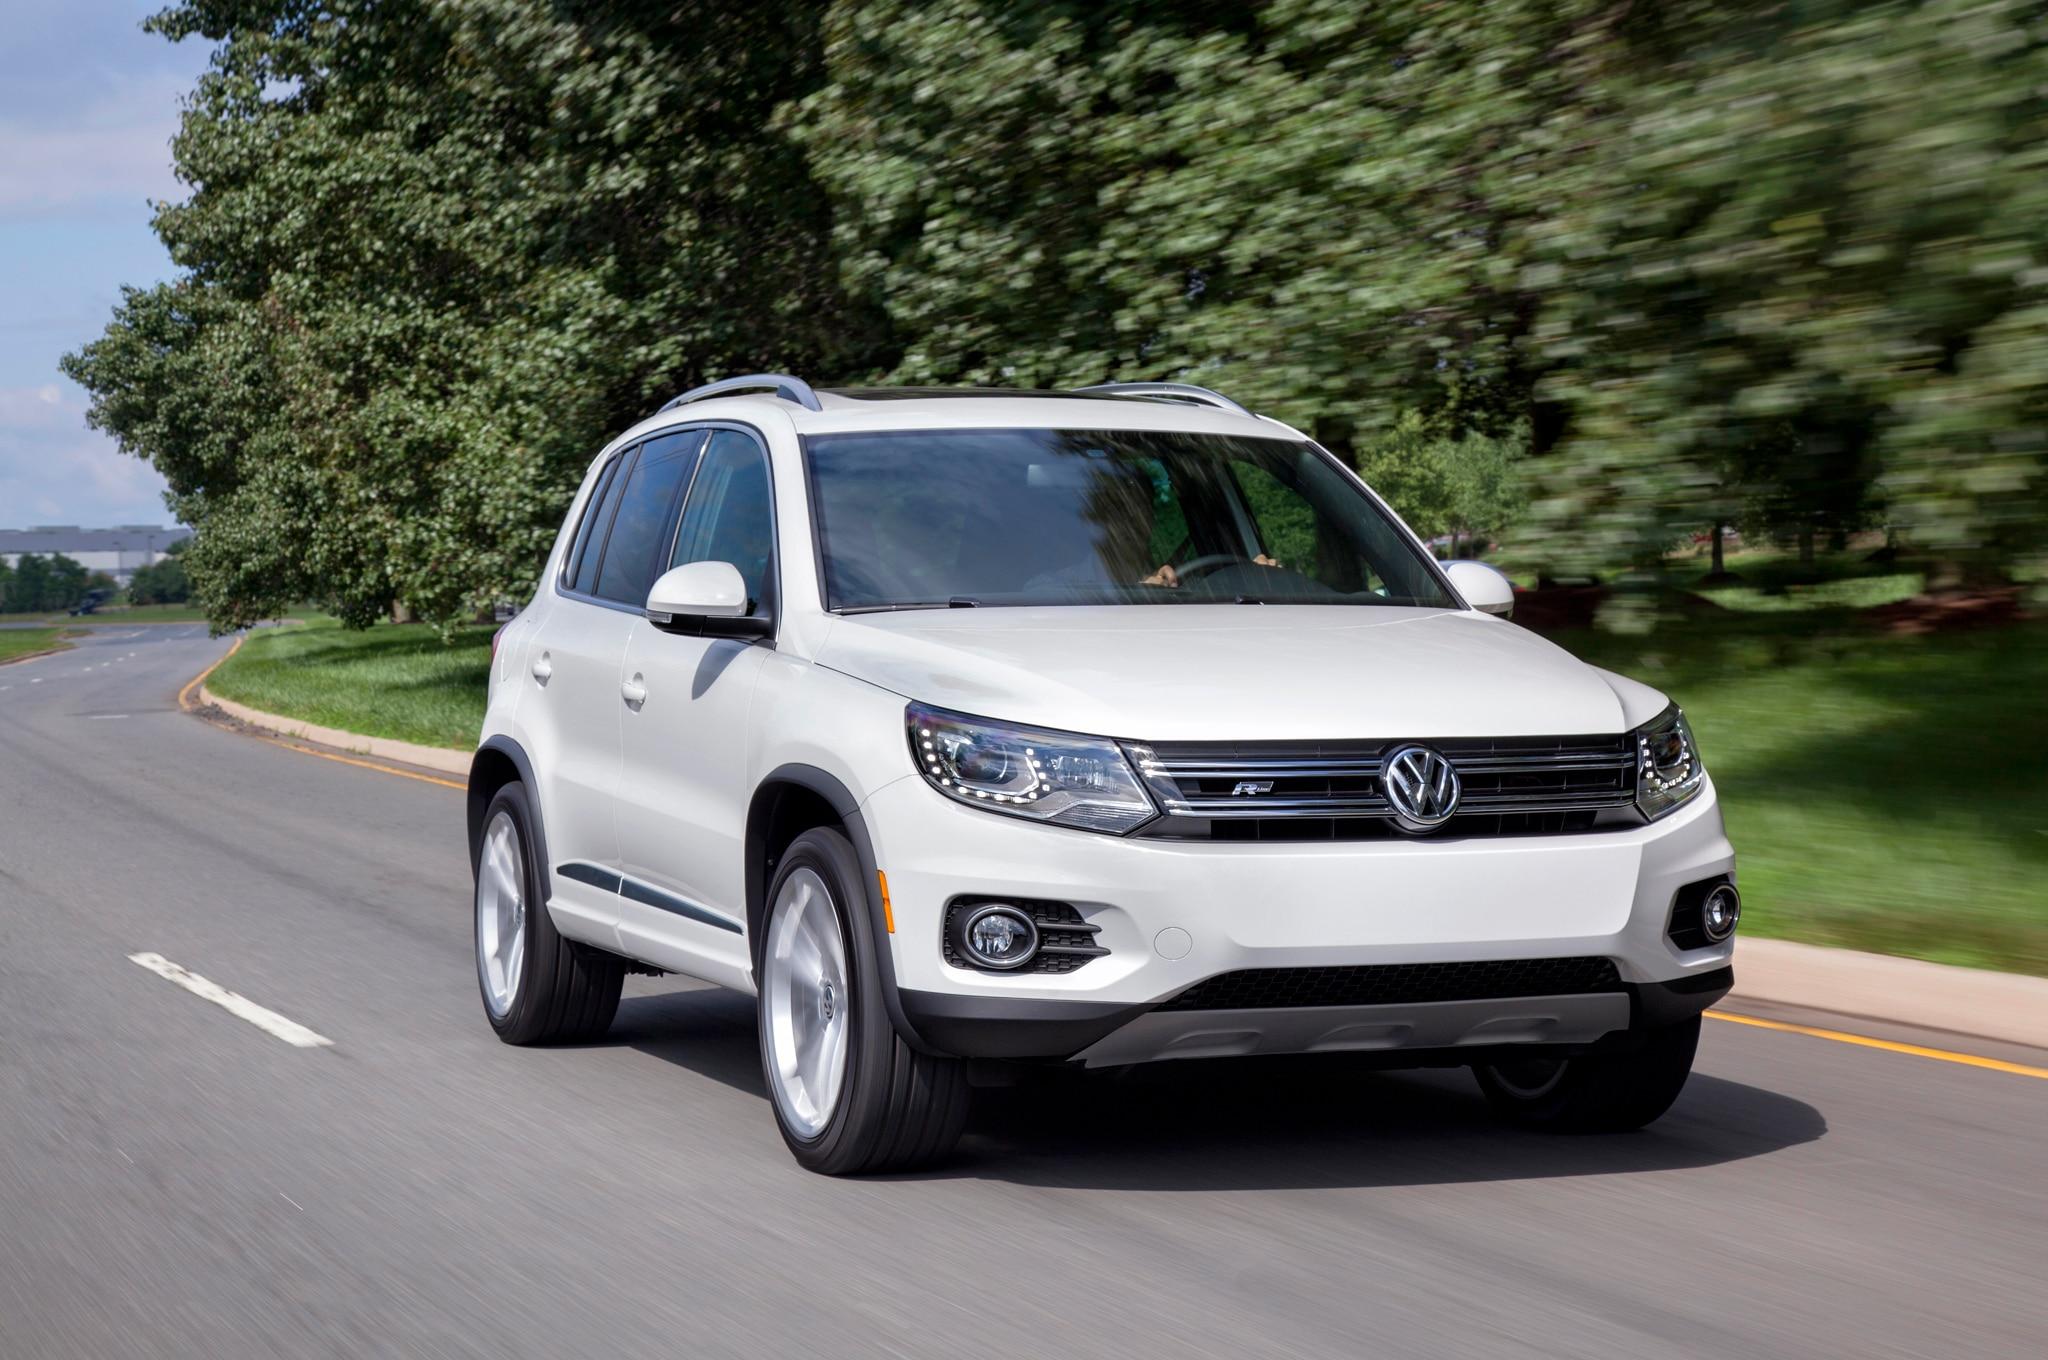 2015 Volkswagen Tiguan Front Three Quarters In Motion1